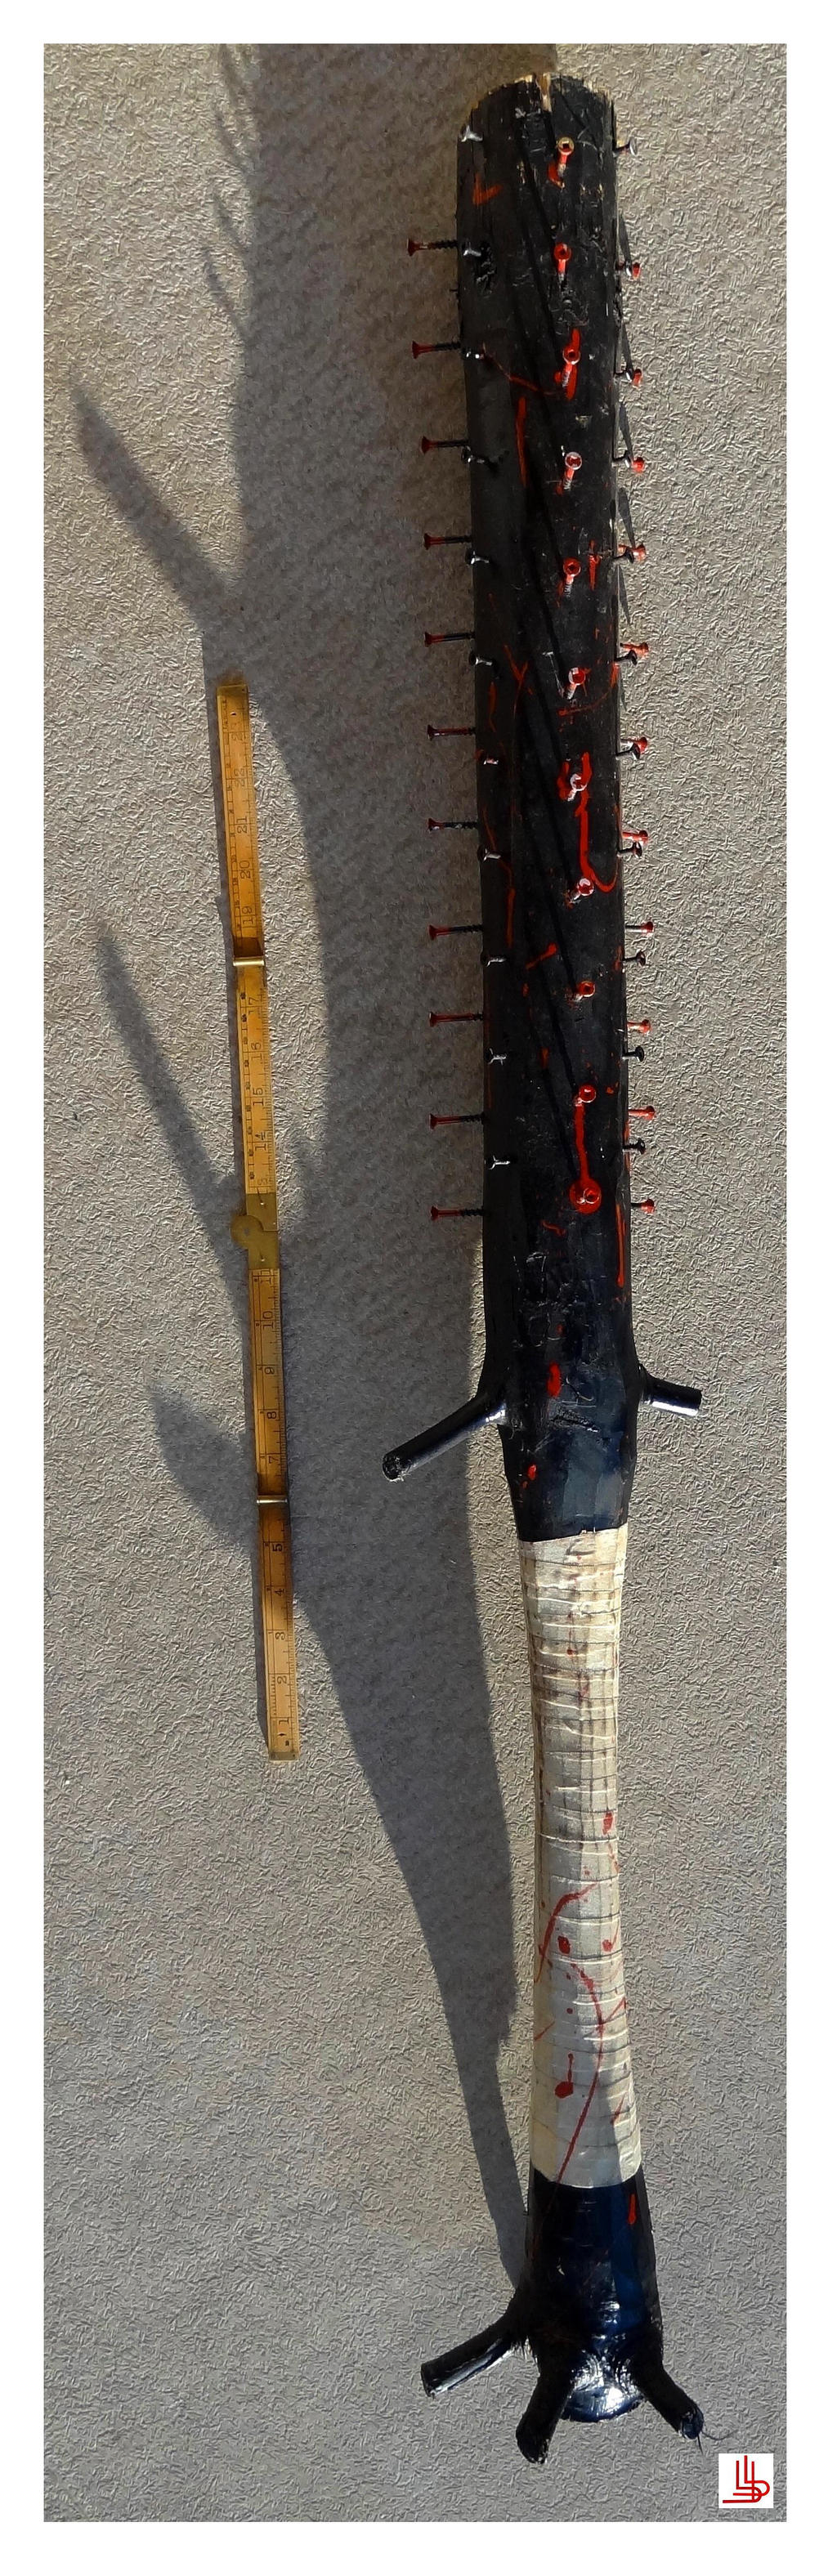 Baseball bat from hell by Obsidian-Asphodel